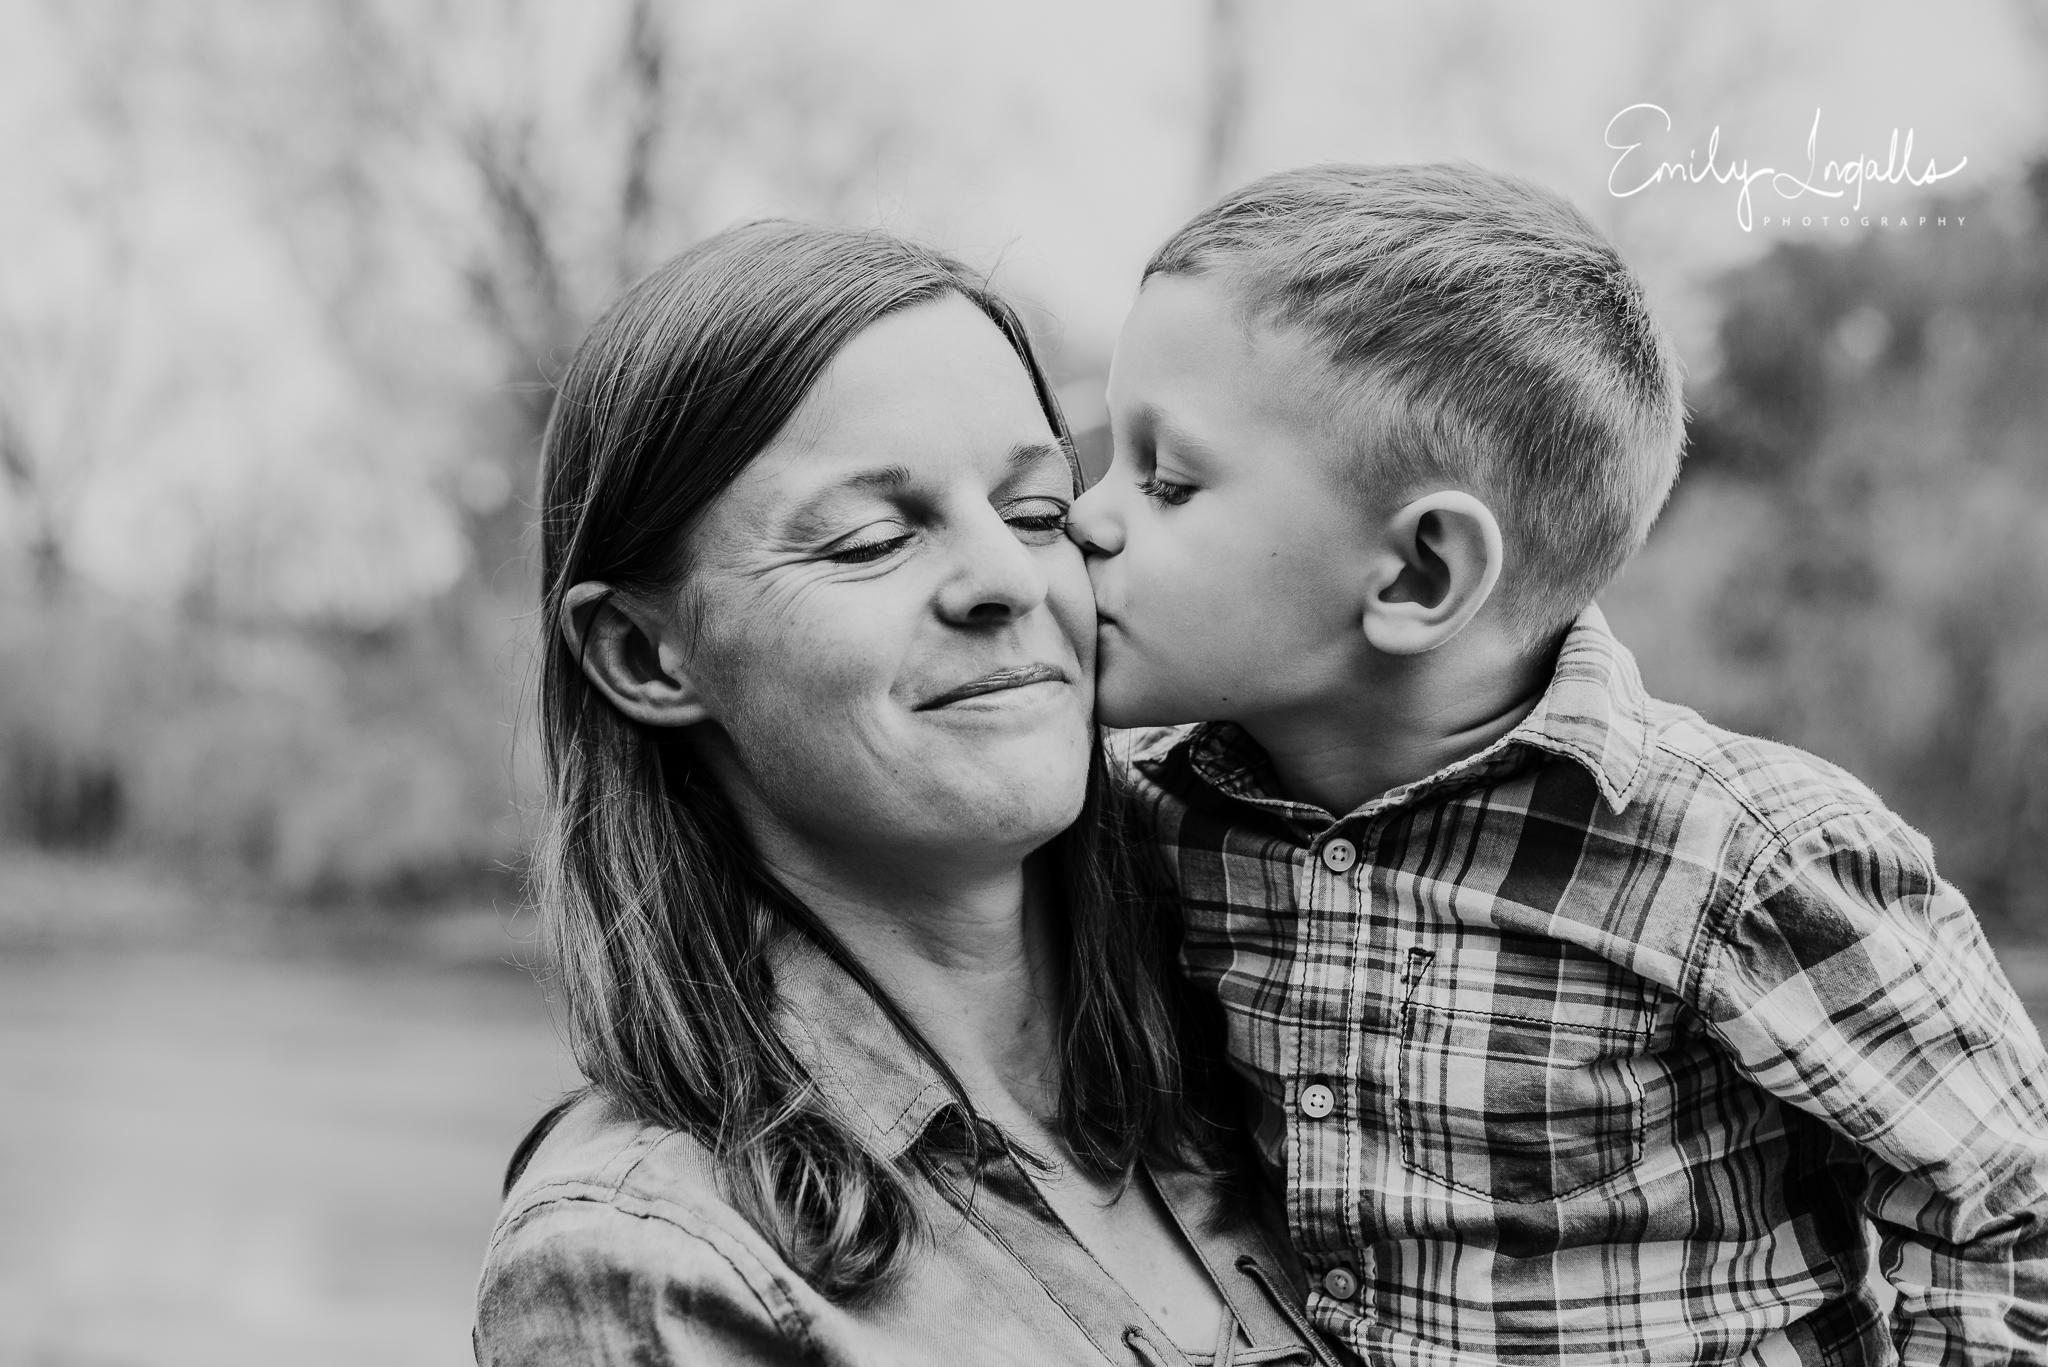 Family Photographer_Round Rock Photographer_Emily Ingalls Photography_Austin Photographer_Pflugerville Photographer_Georgetown Photographer-10.jpg